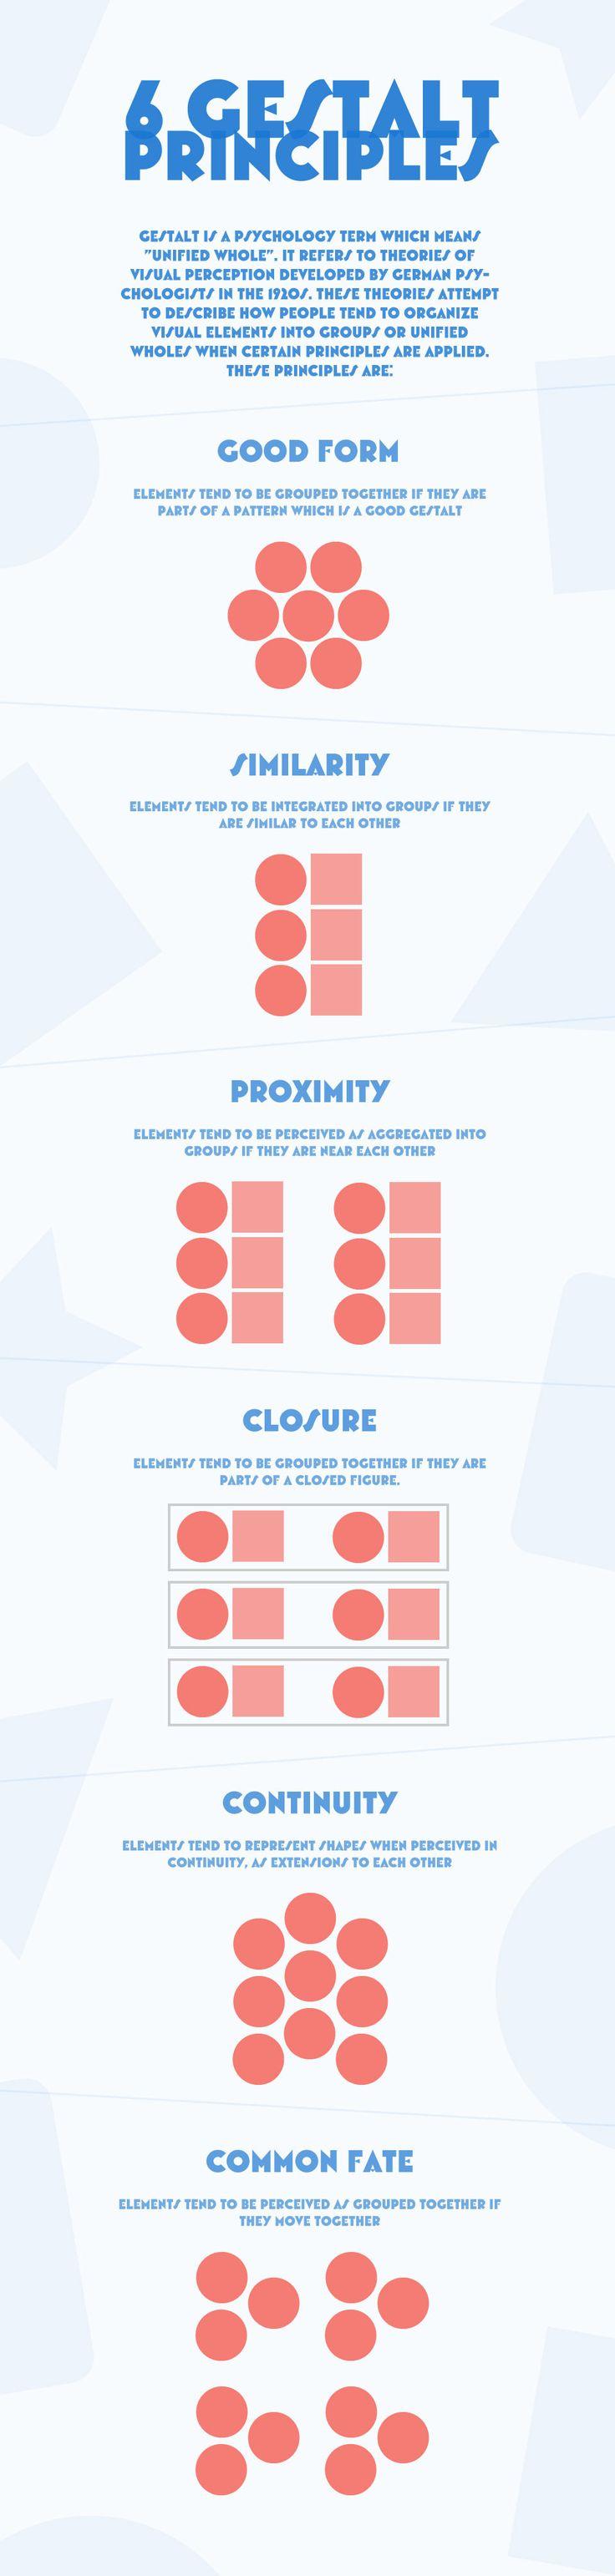 6 GESTALT PRINCIPLES on Behance | Just a little dataviz to illustrate the…